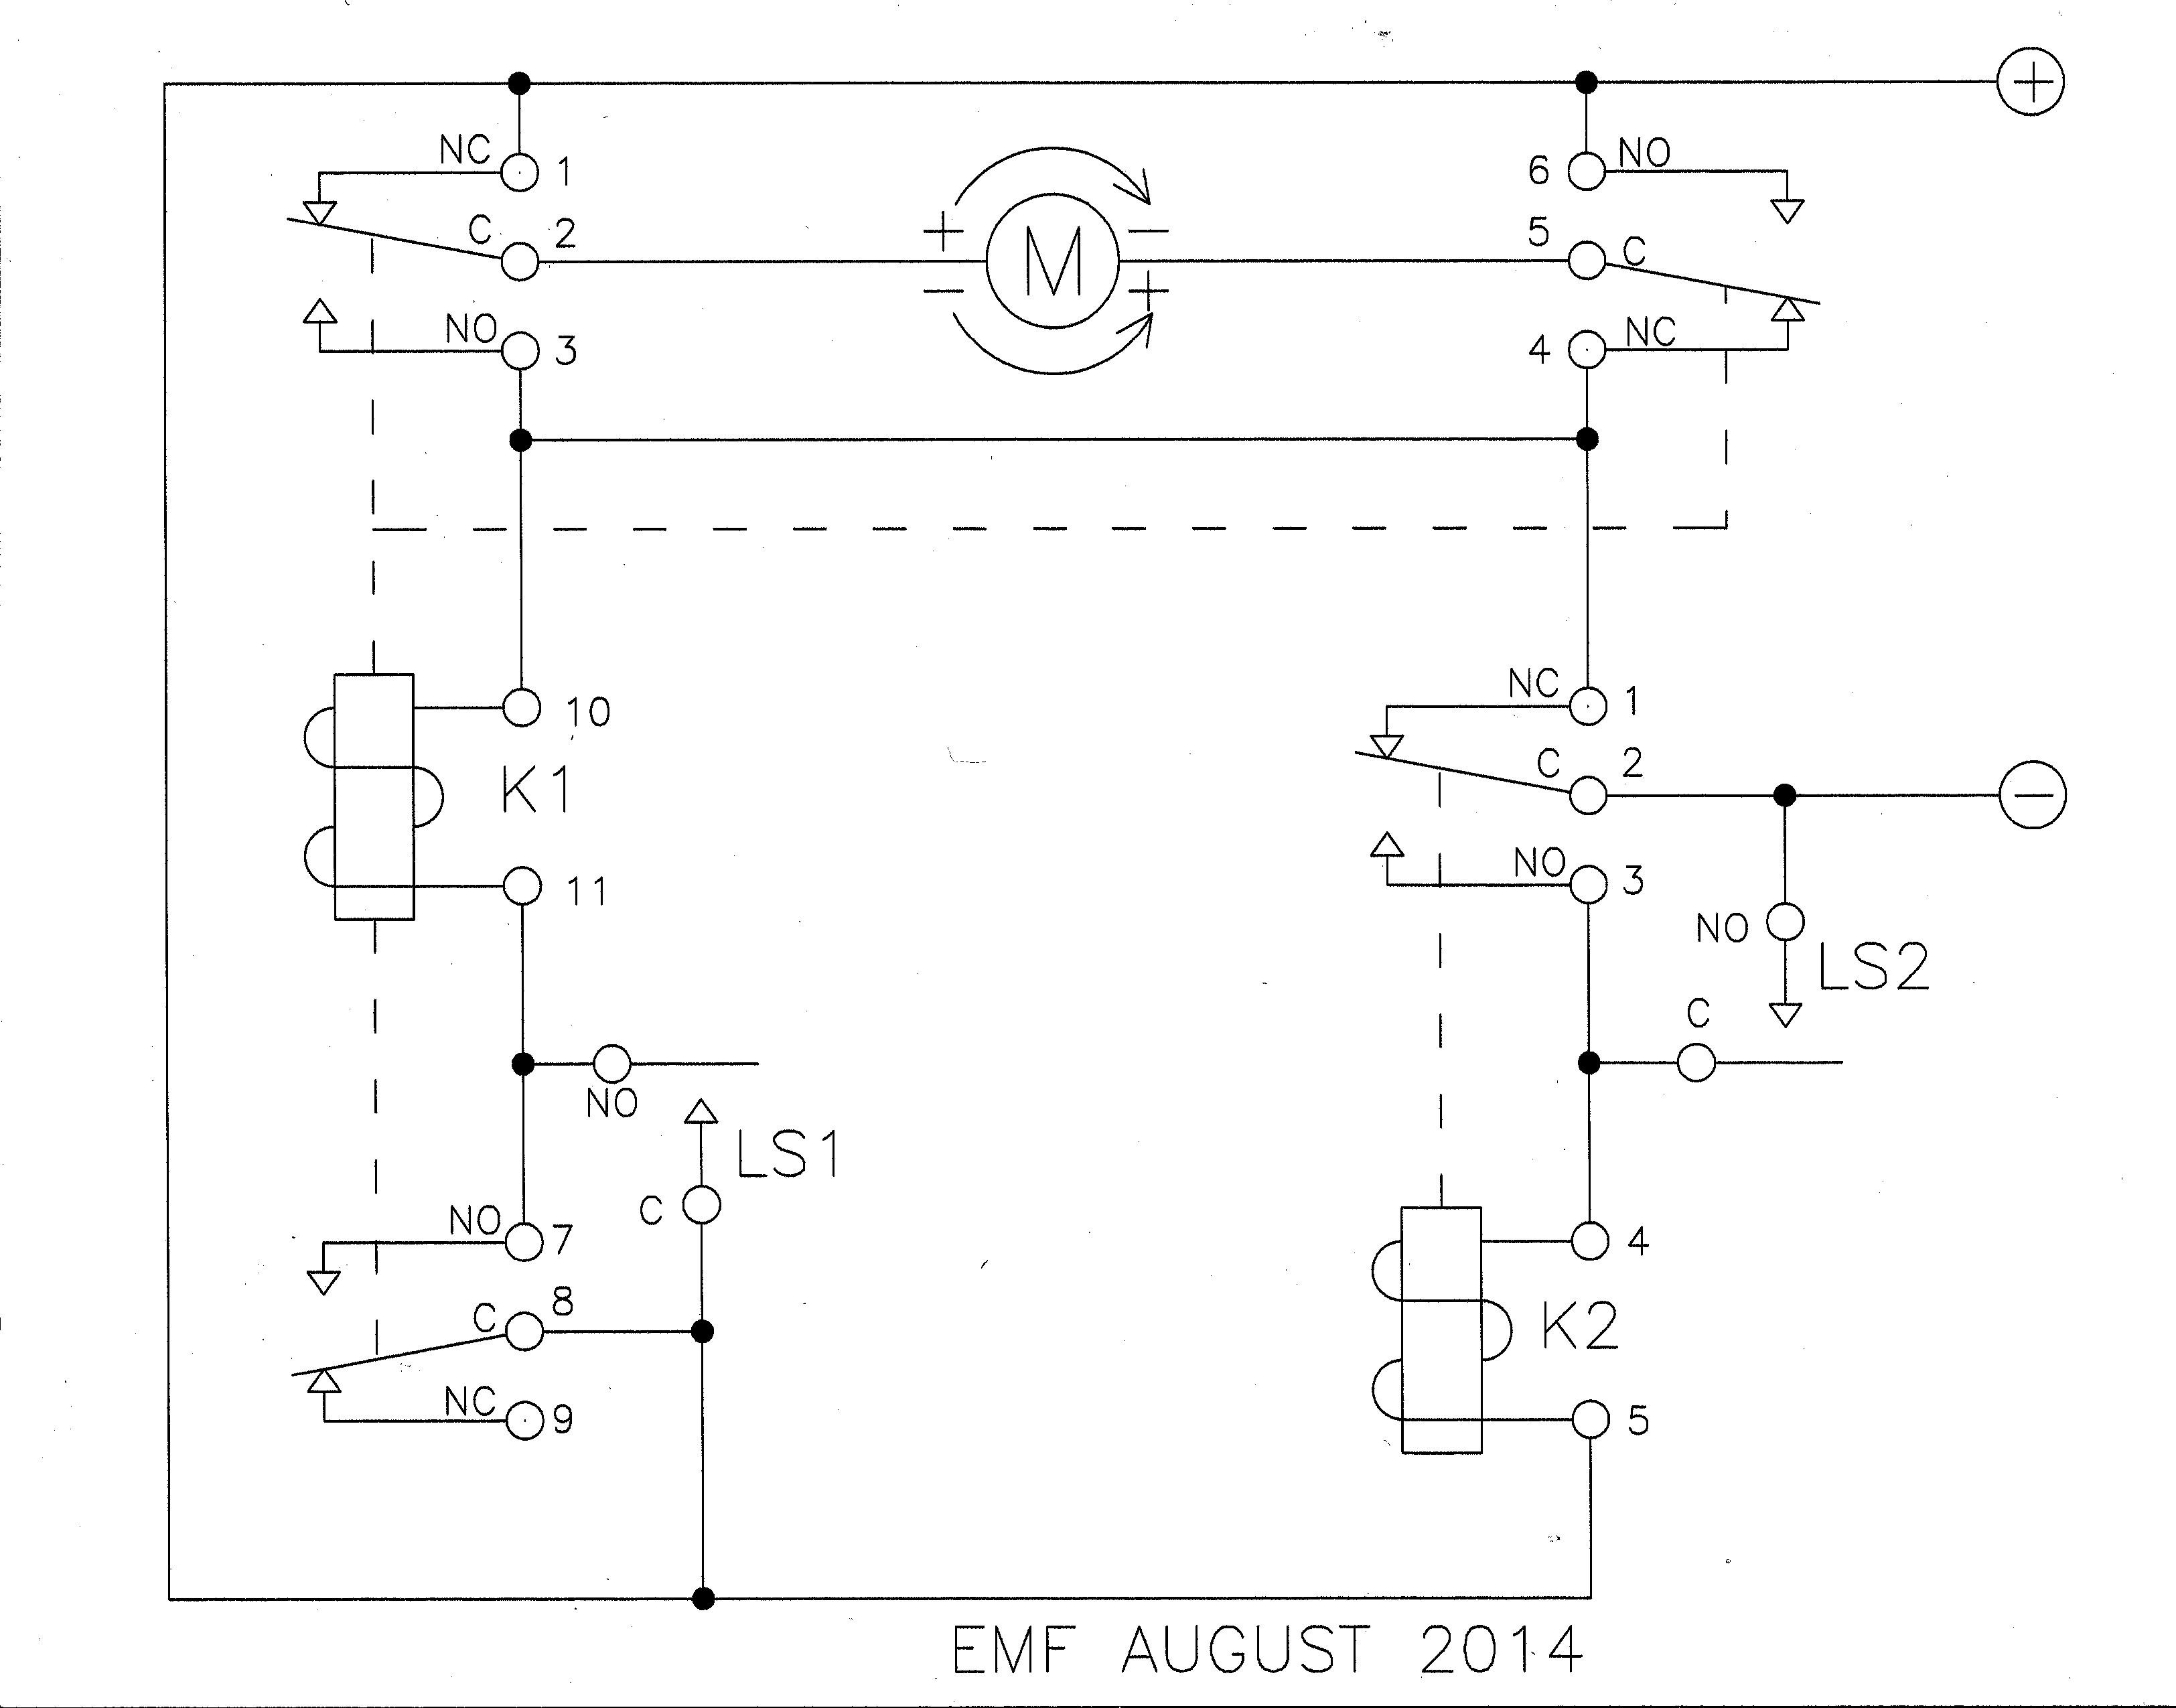 Fisher Plow 3 Wire Plug Diagram Manual Of Wiring Magic Jack Western Ice Breaker